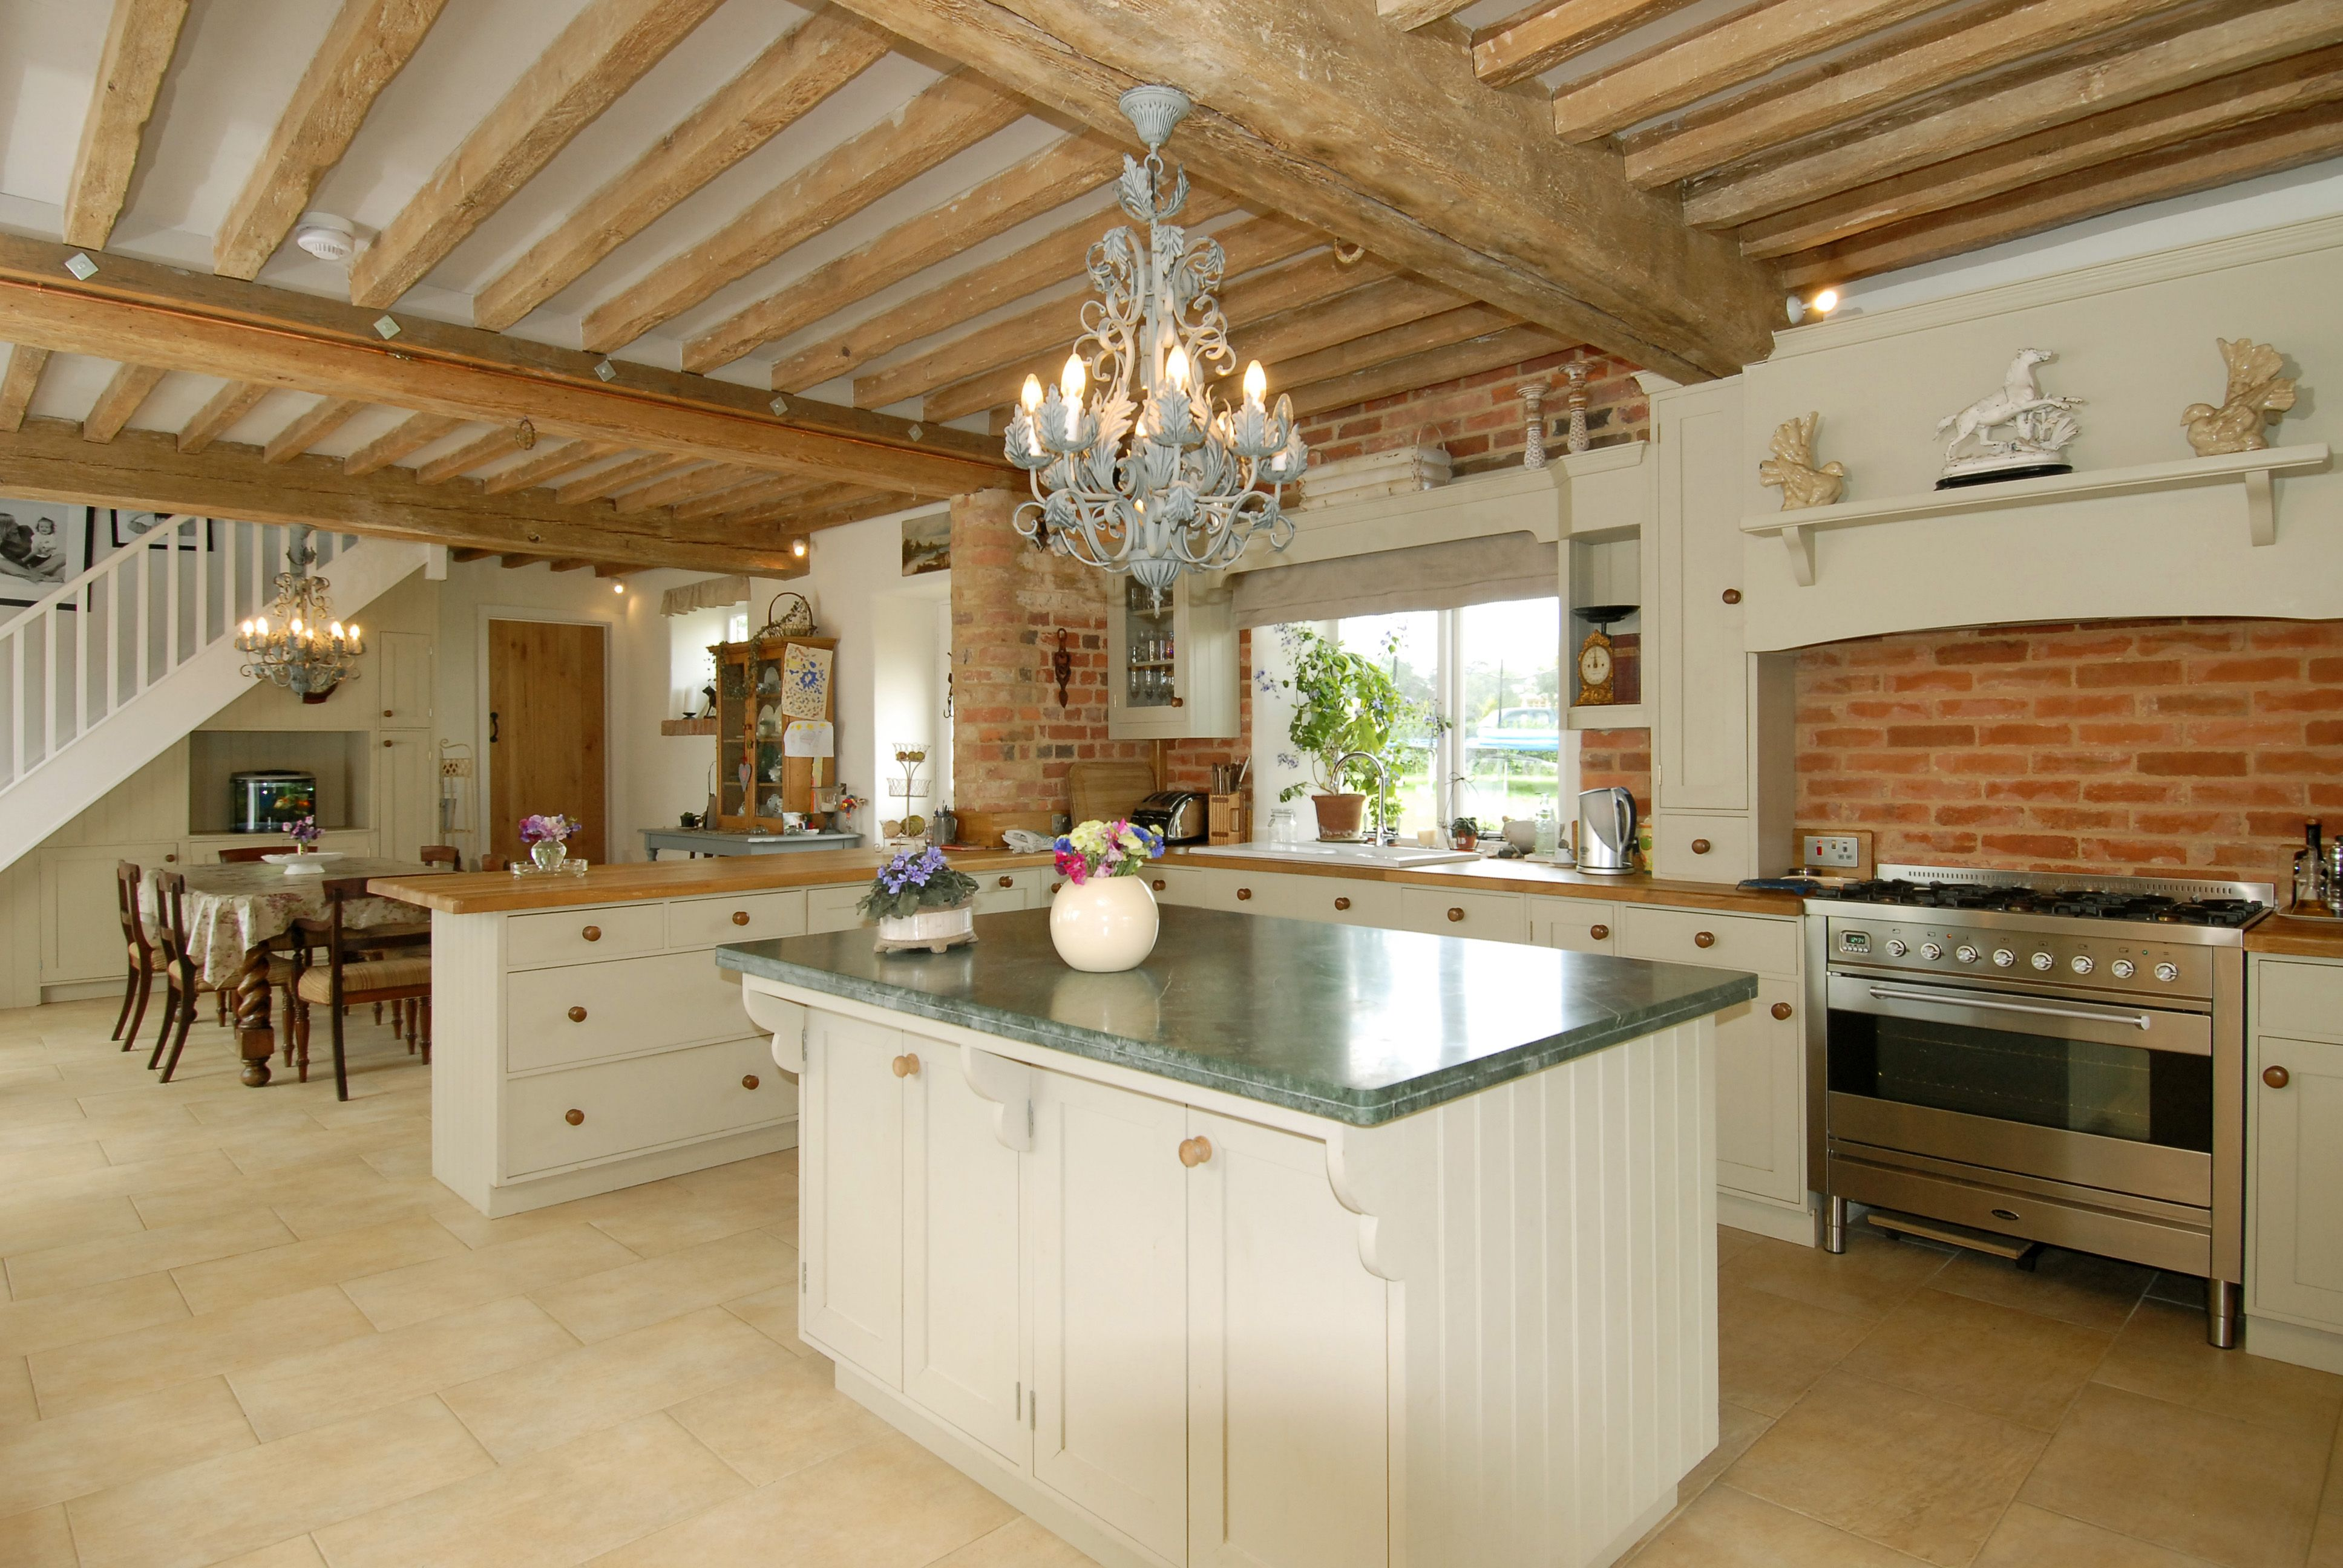 open plan kitchen design photos open kitchen design 17 Best Ideas About Open Plan Kitchen Interior On